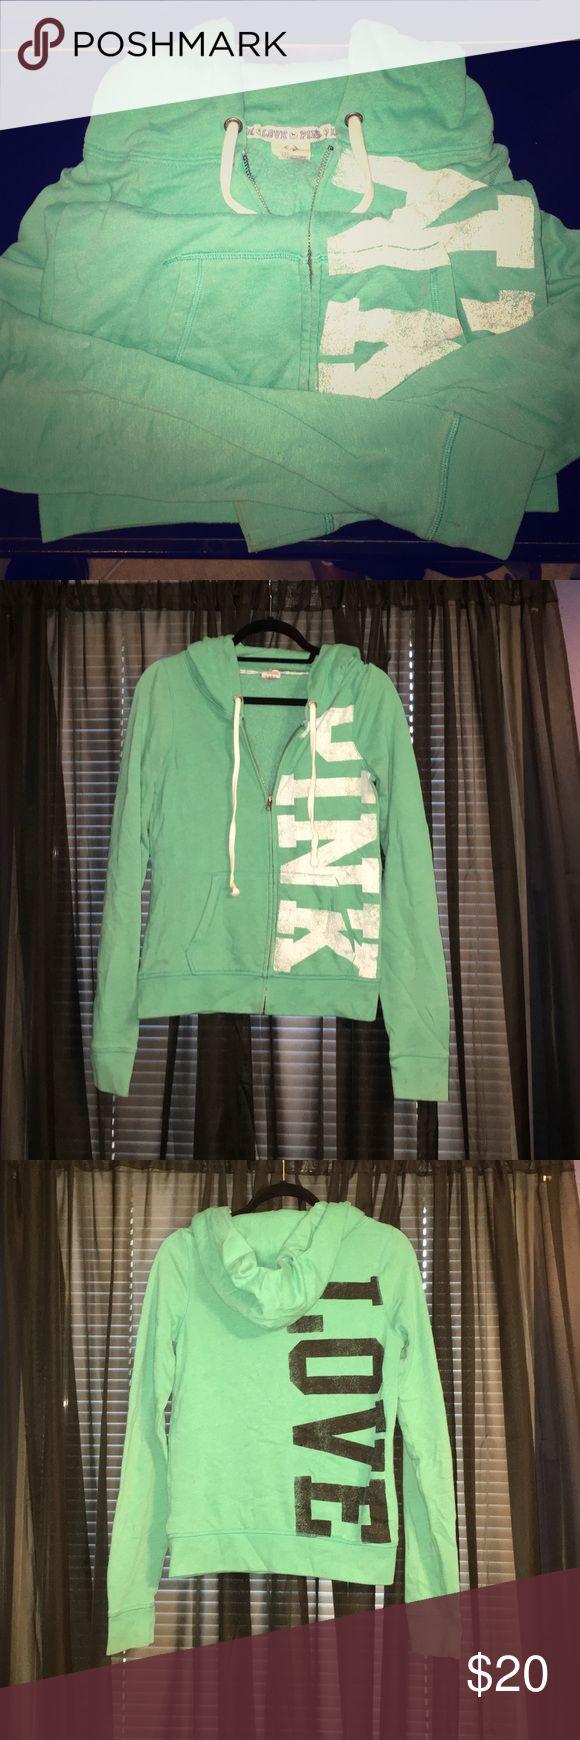 PINK Aqua/Green Zip Up Sweatshirt Gently Worn, Still Good Condition PINK Victoria's Secret Other